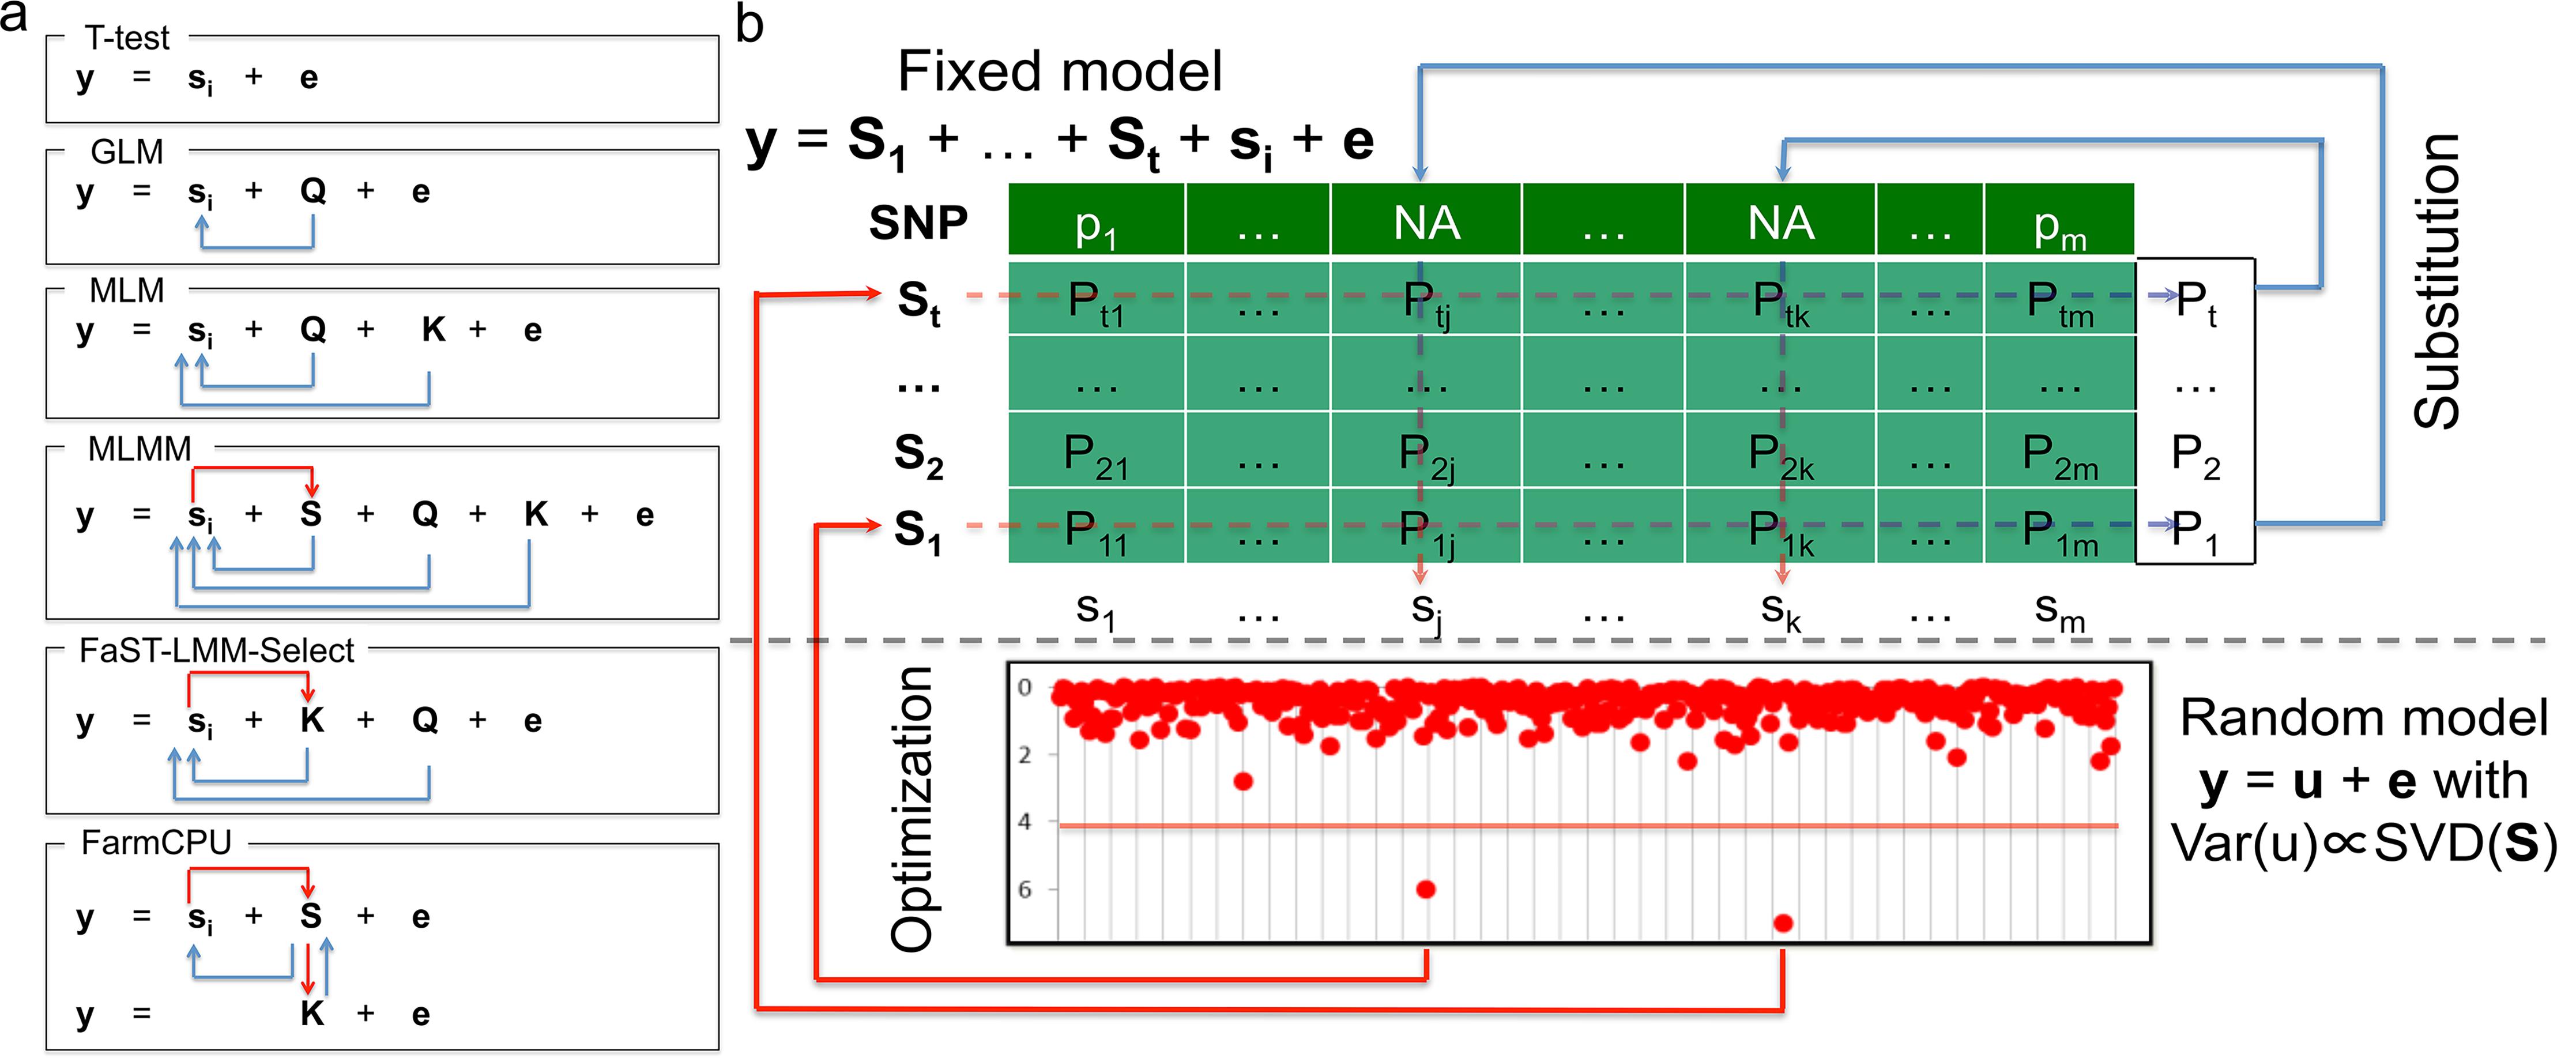 Conceptual development and procedure of FarmCPU.